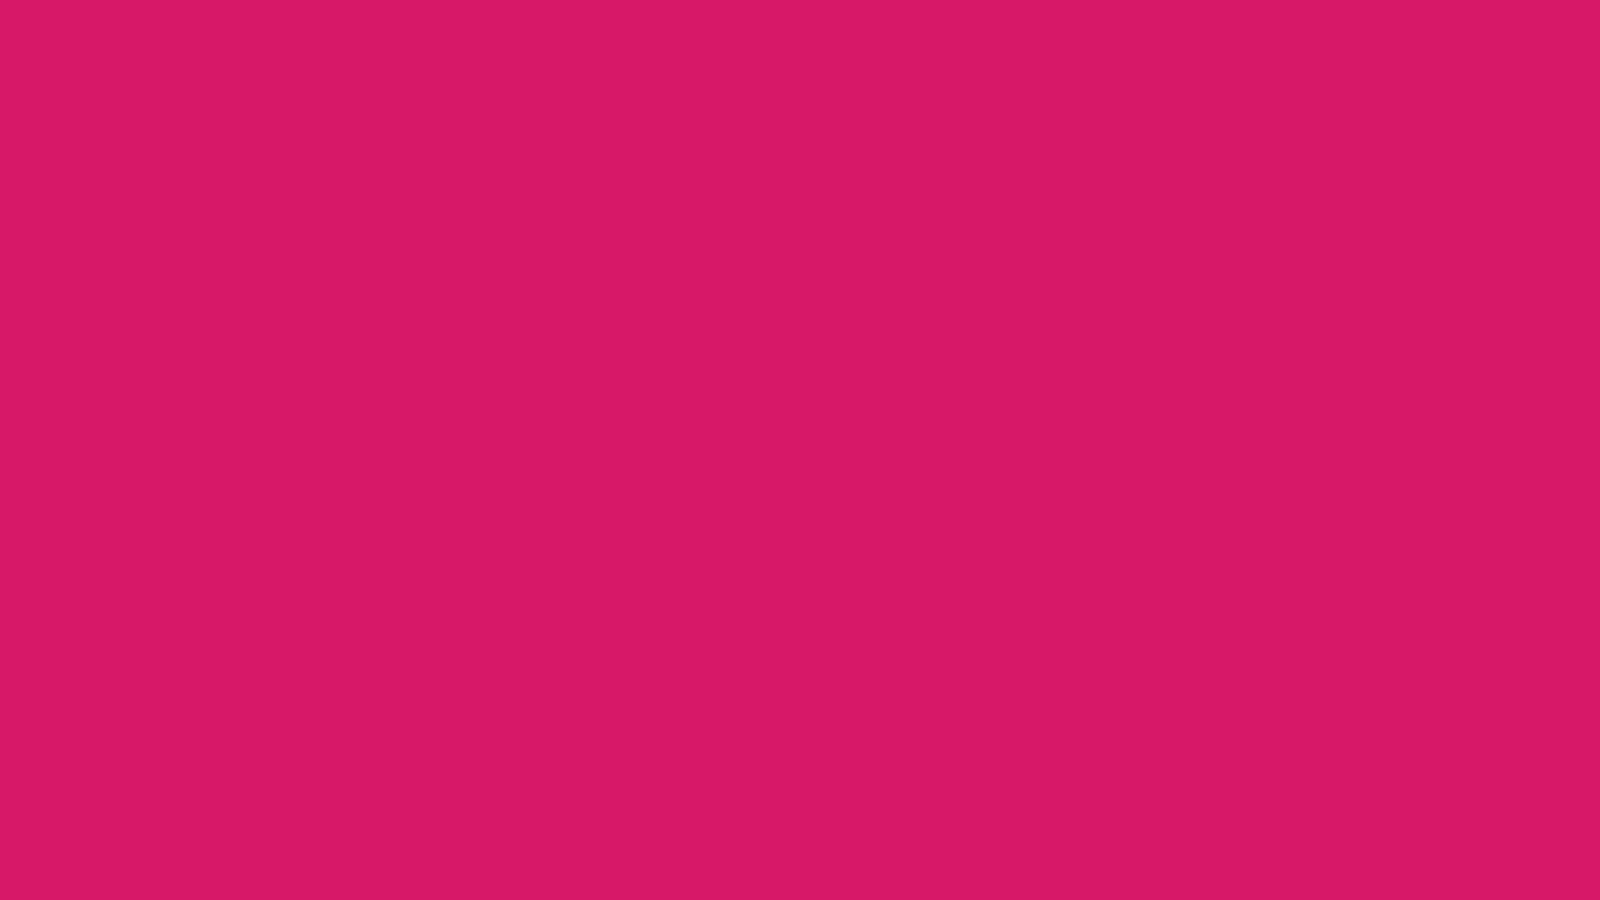 1600x900 Dogwood Rose Solid Color Background